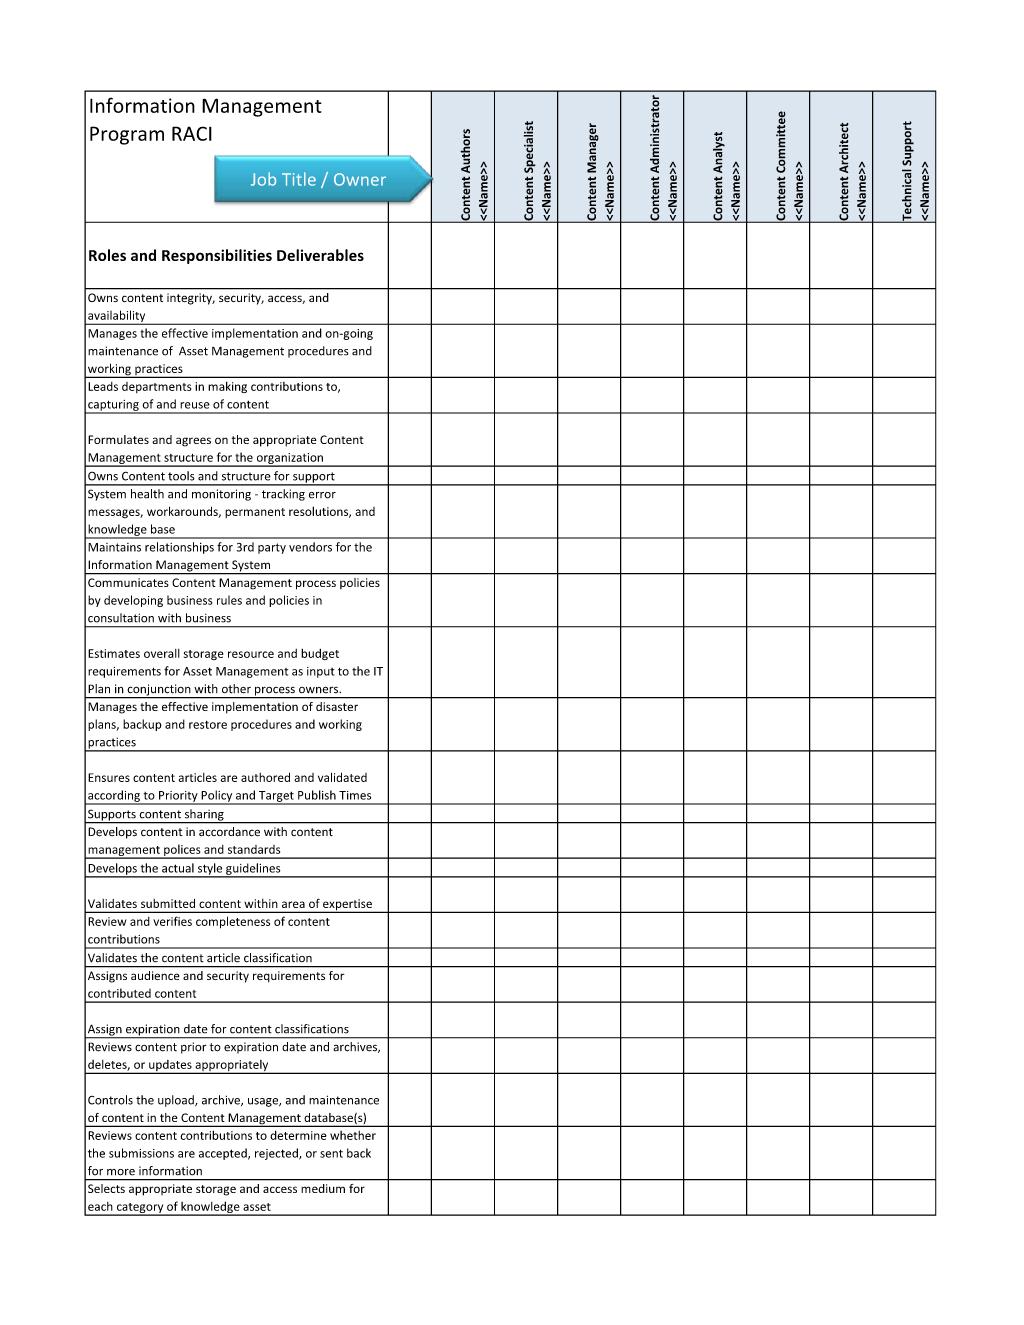 Raci Matrix Worksheet